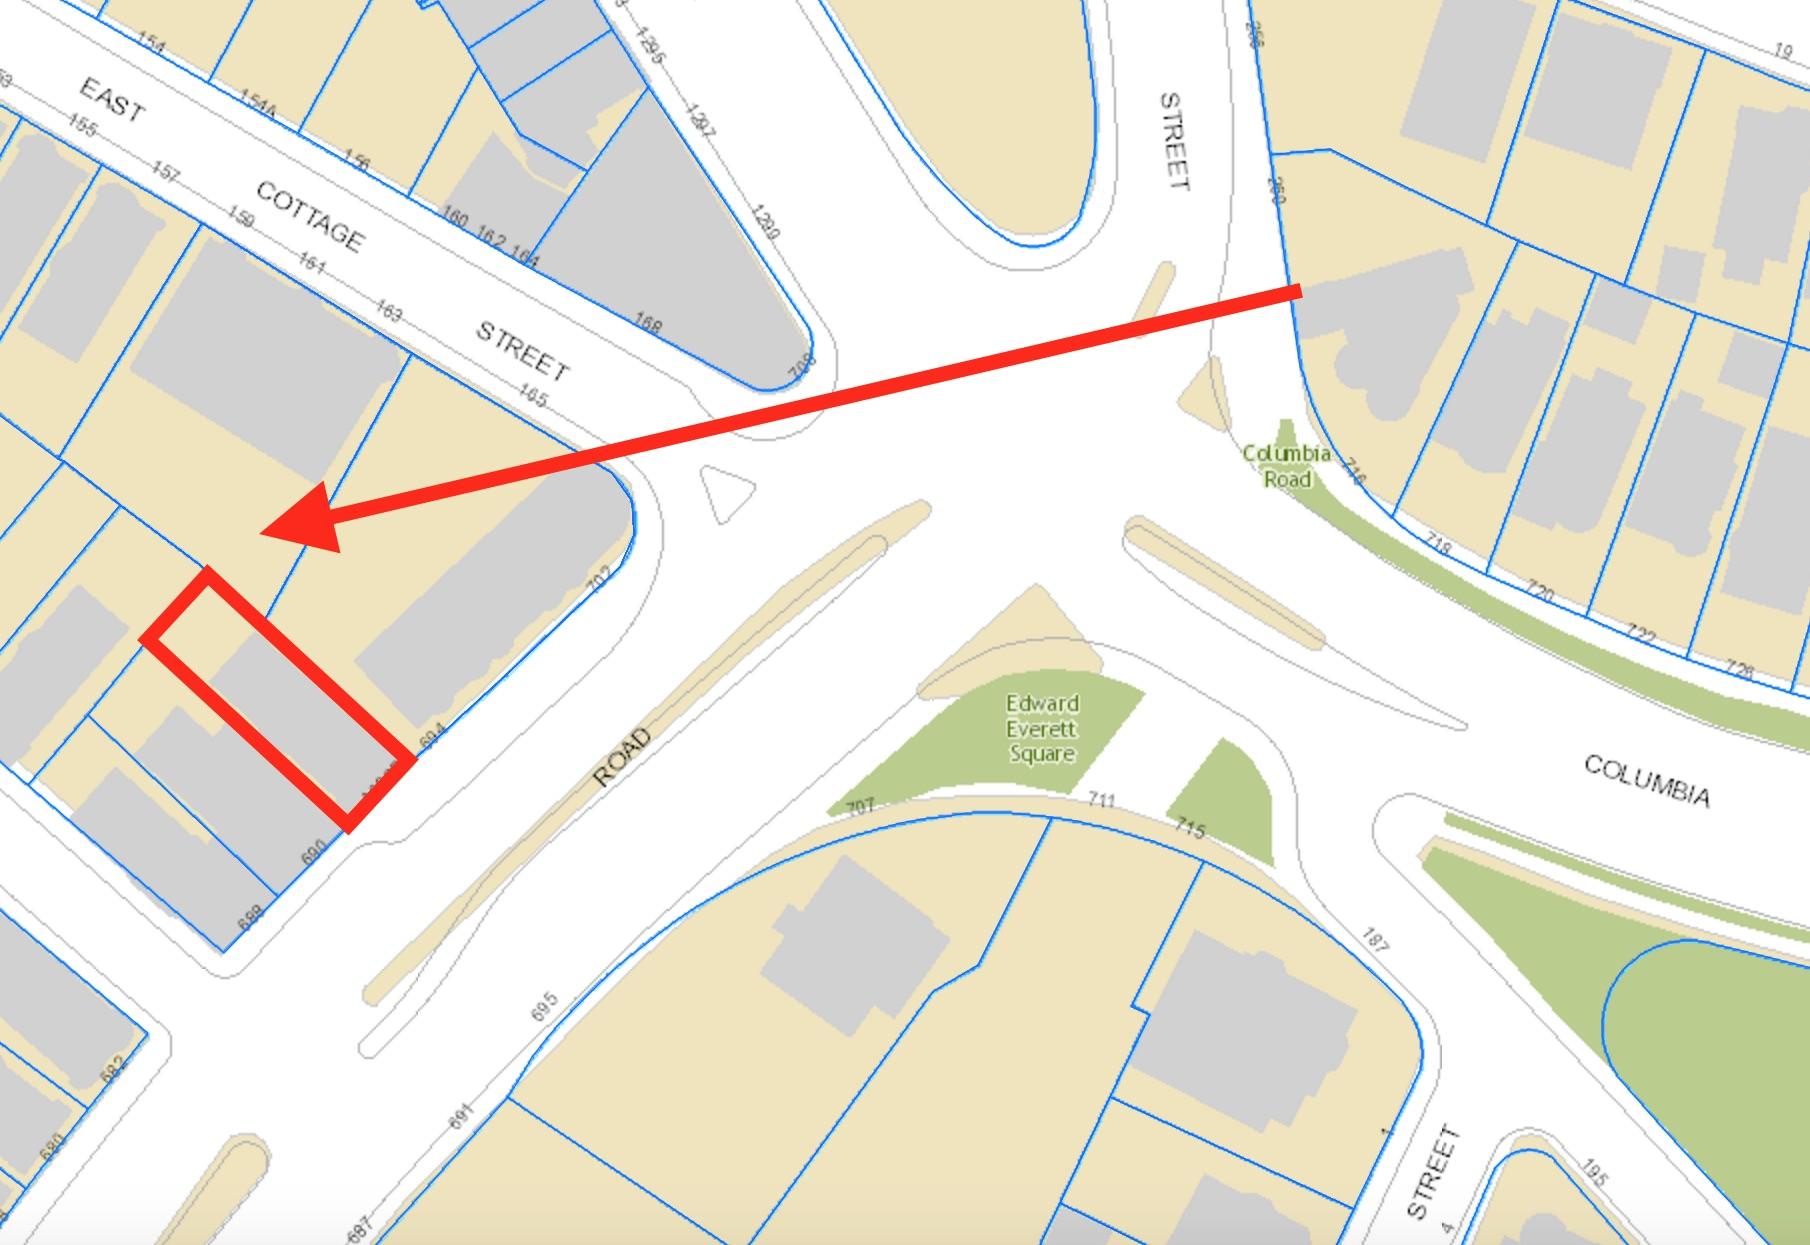 692 columbia road edward everett square dorchester boston boston brokerage group rental property